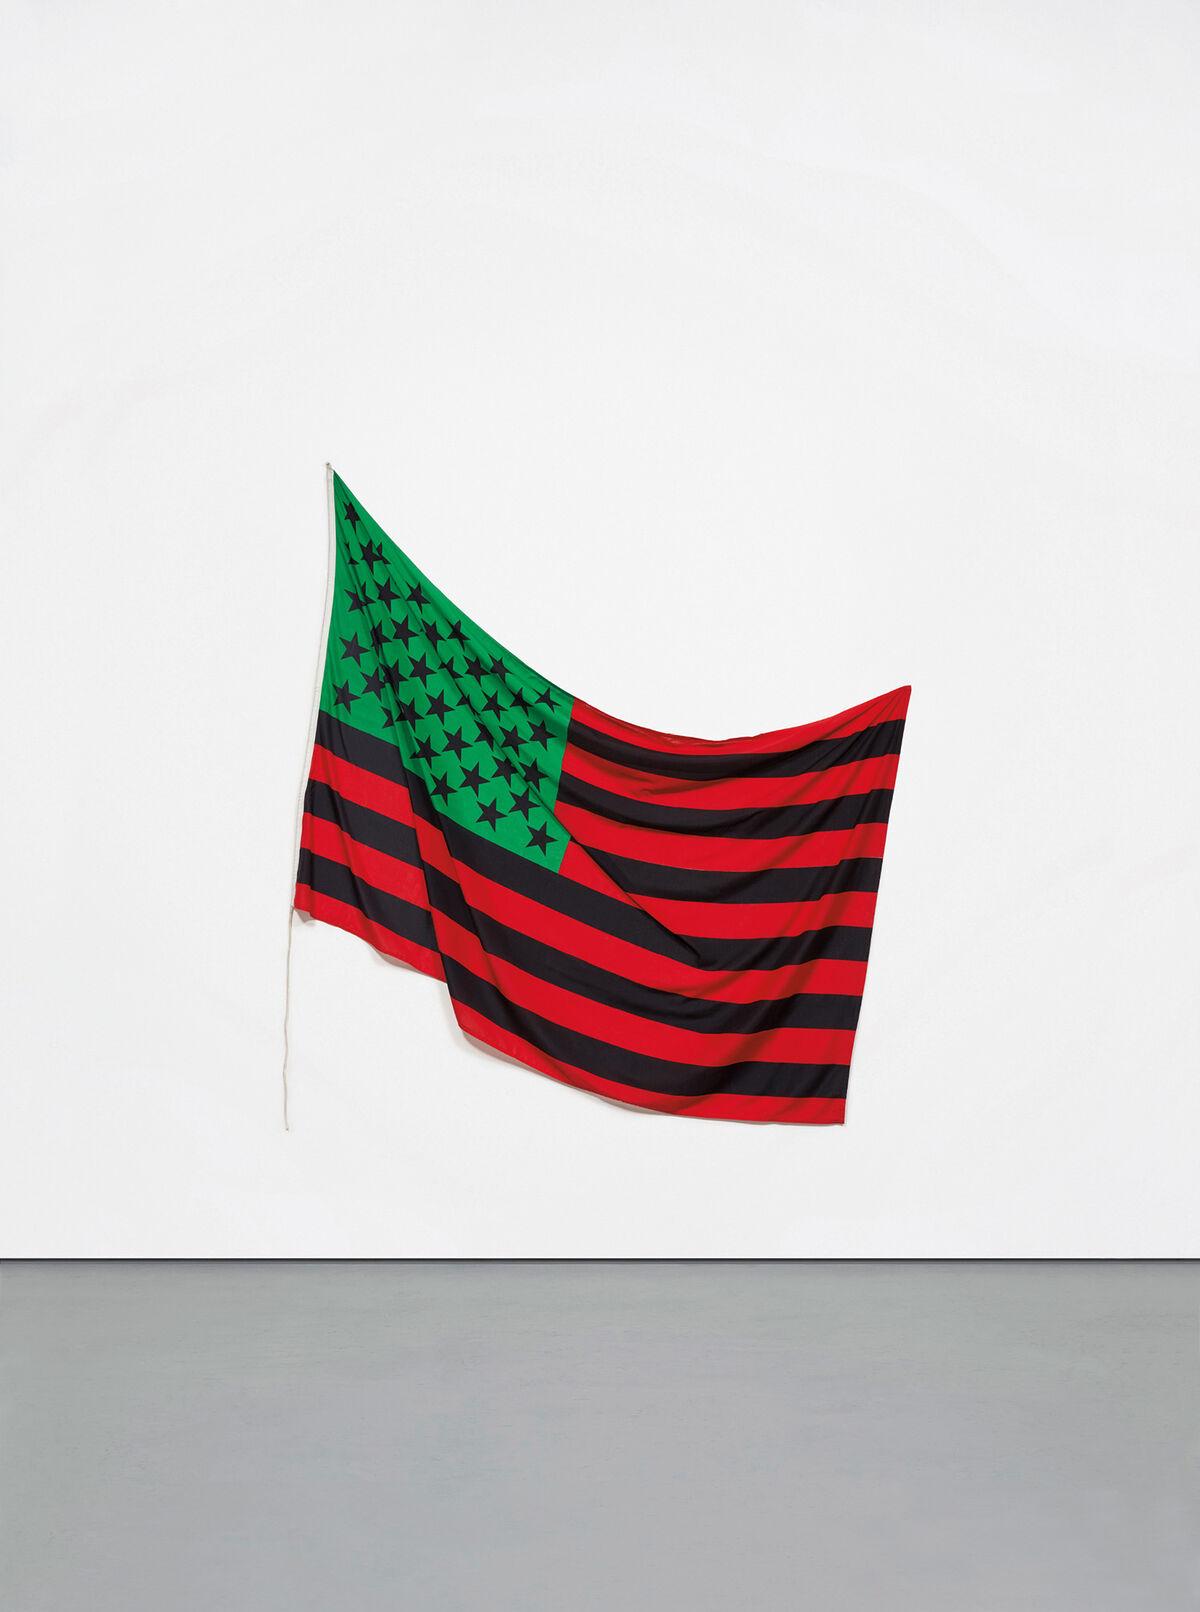 David Hammons, American Flag (1990). Est. $1.5 million–2 million. Image courtesy  Phillips.